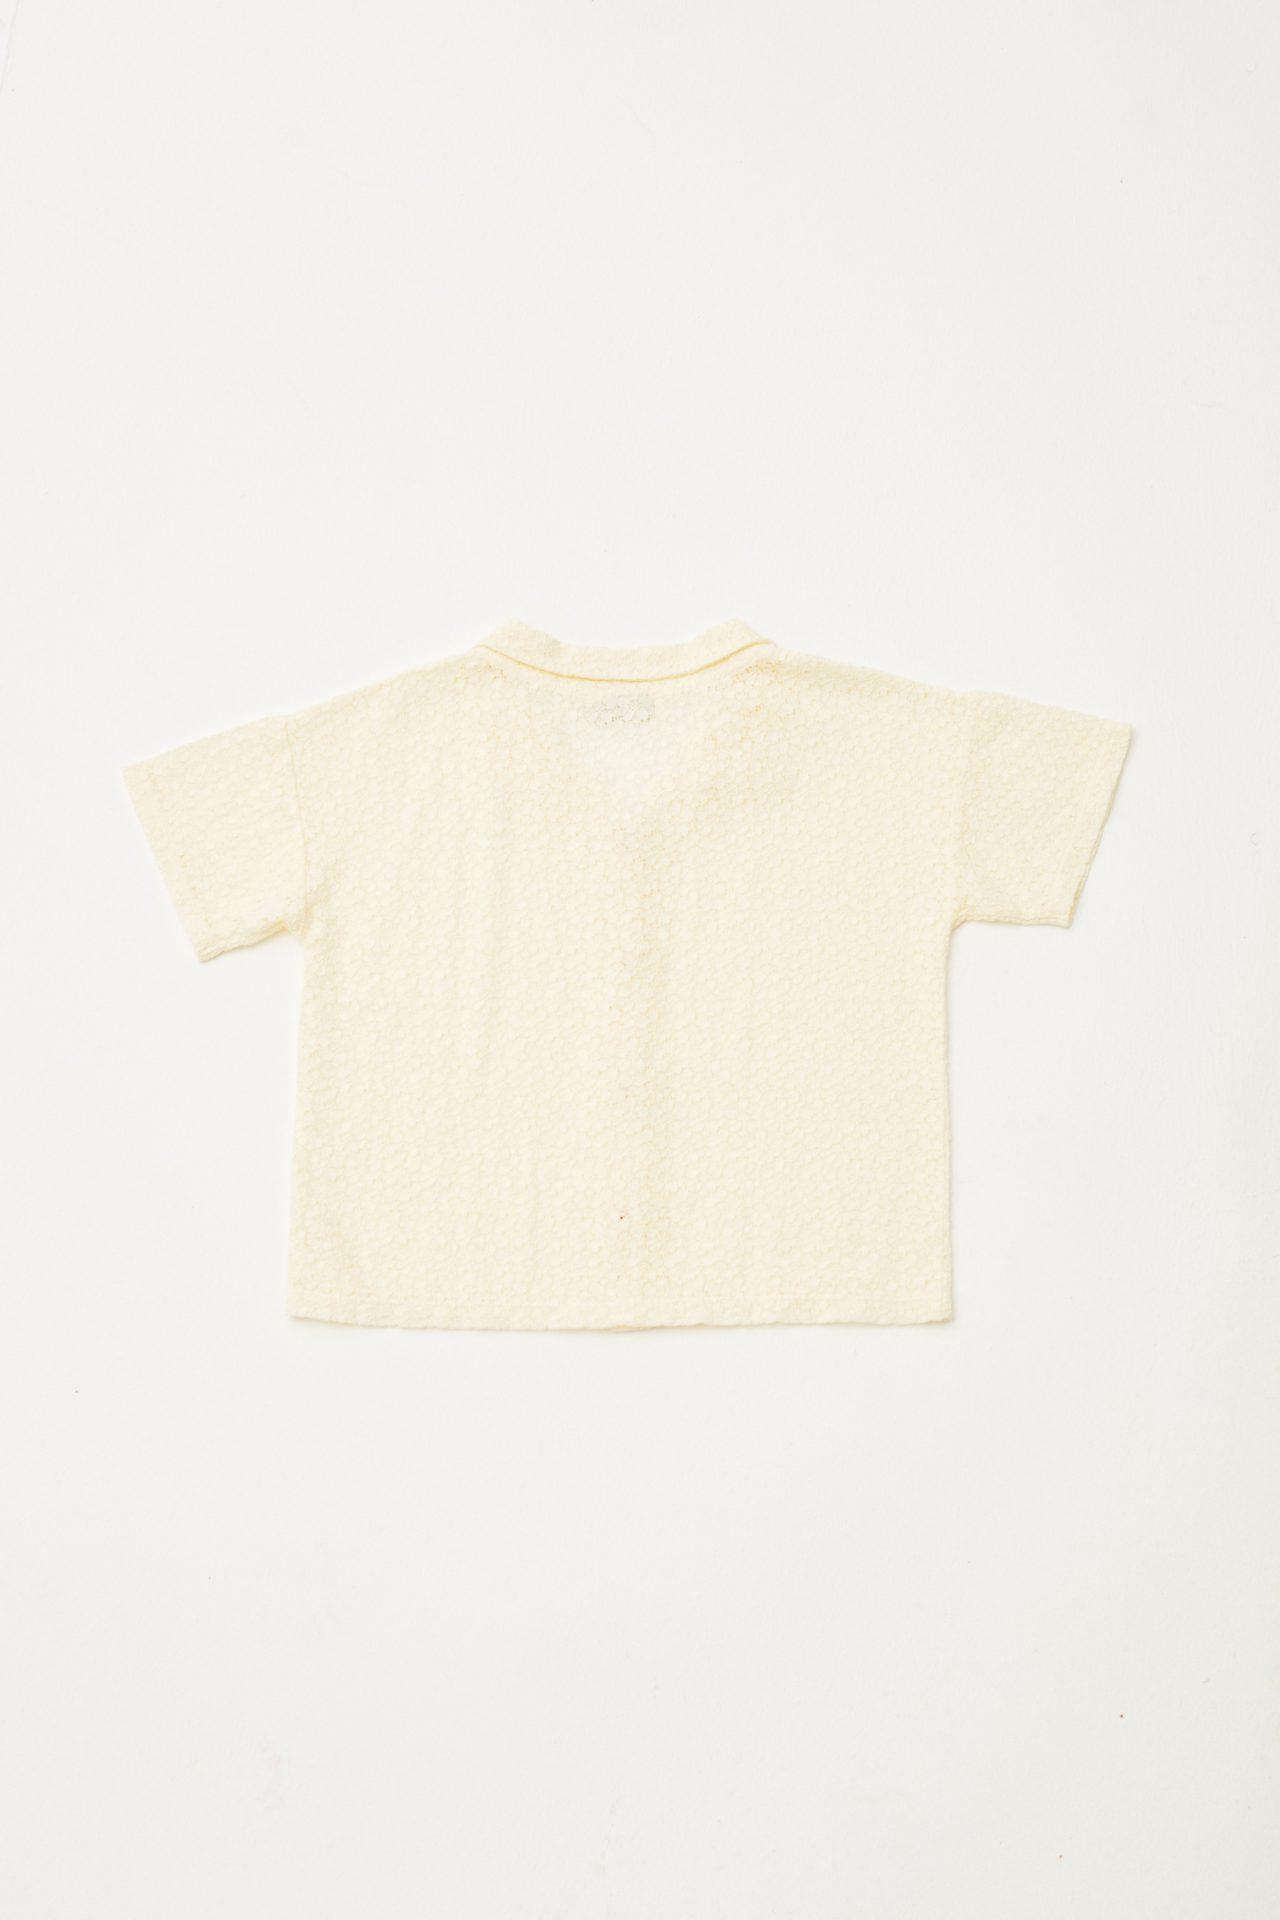 Lace Shirt back